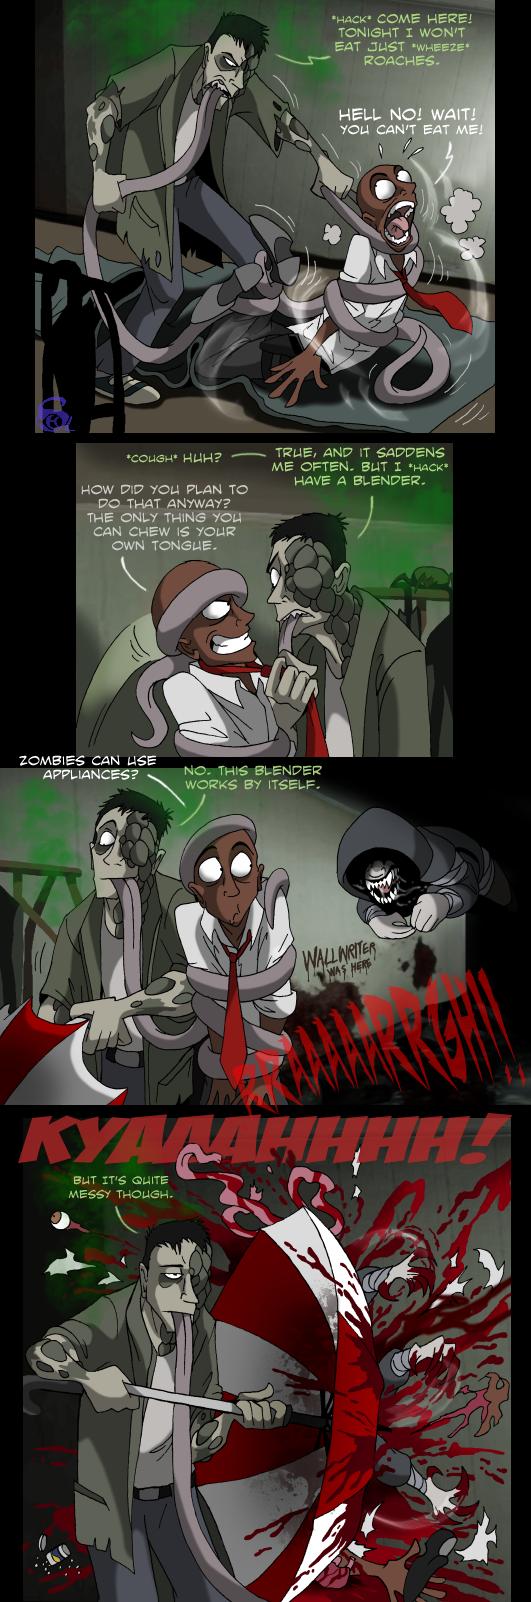 L4D - zombie appliance